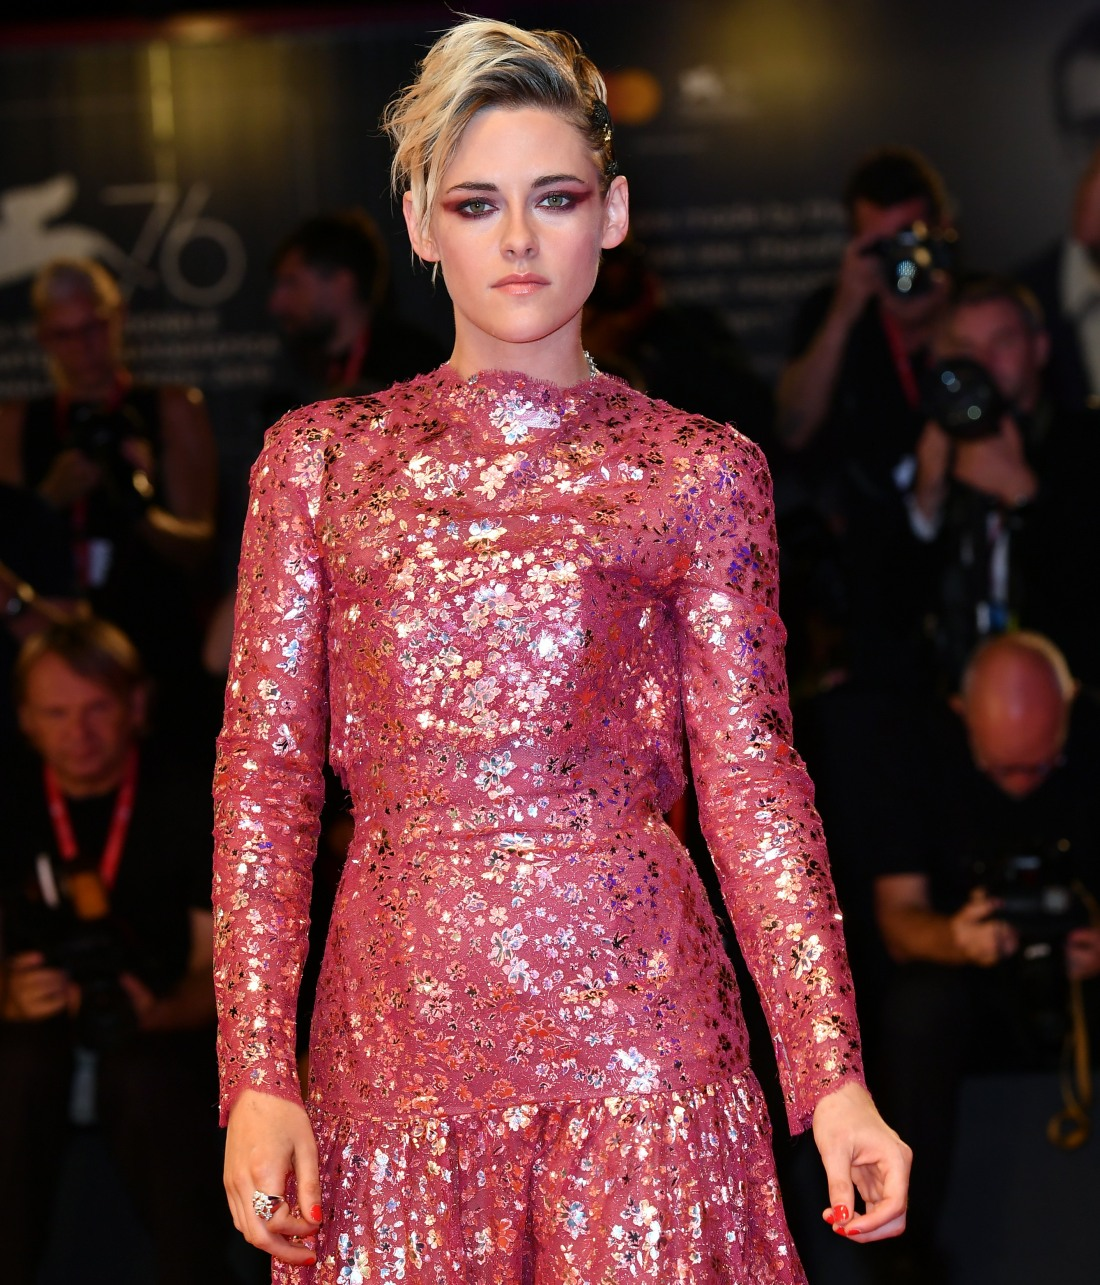 Kristen Stewart 'Seberg' film premiere, 76th Venice Film Festival, Venice, Italy 30/08/2019